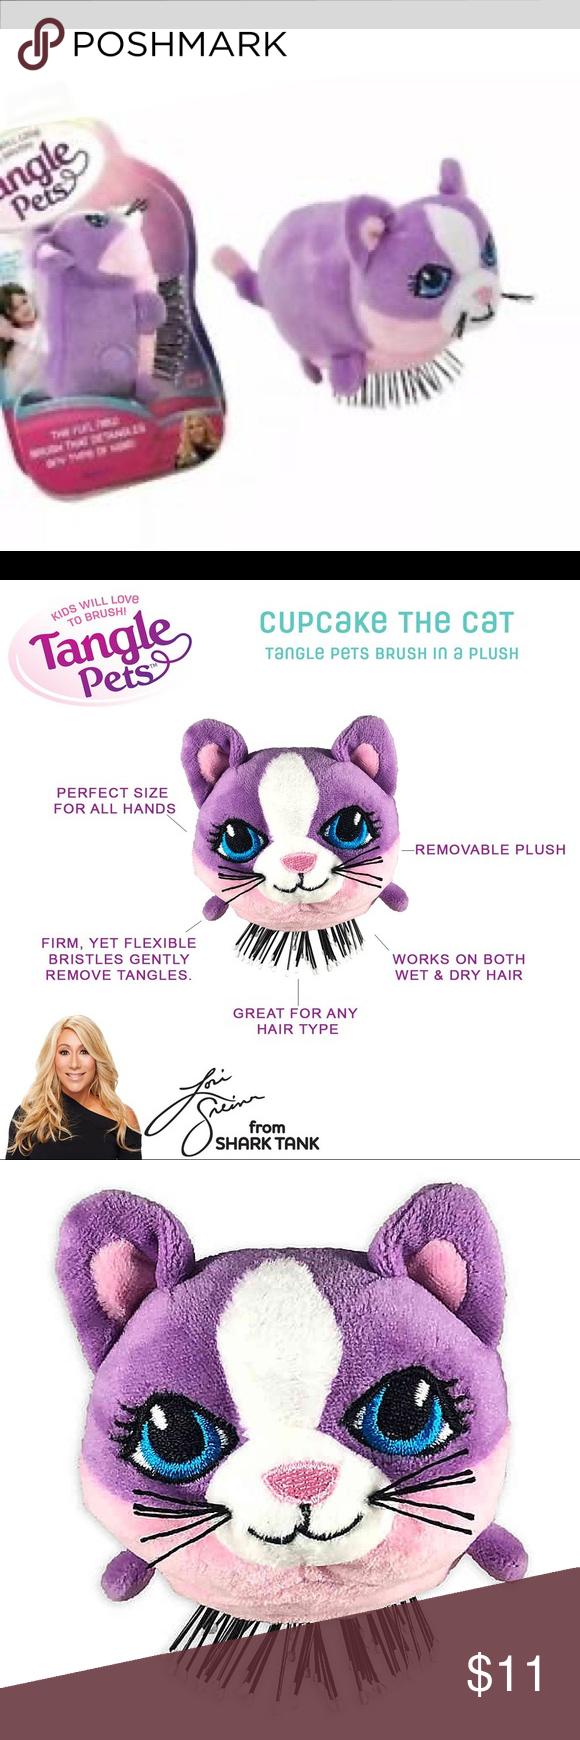 Sold Kids Detangler Brush Cupcake The Cat Purpl Nwt